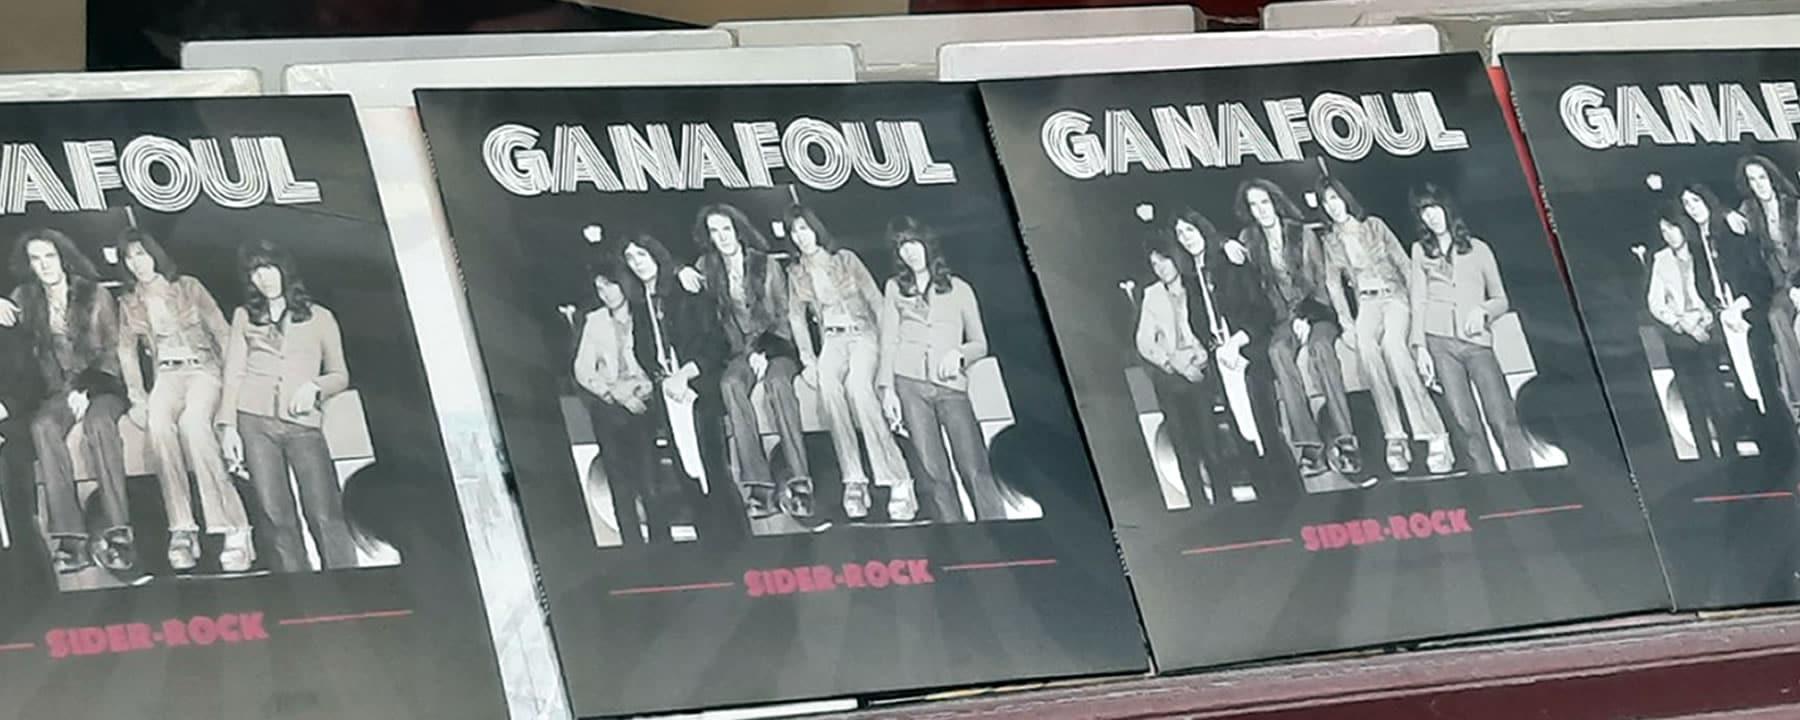 Ganafoul sentimentale - Globrocker